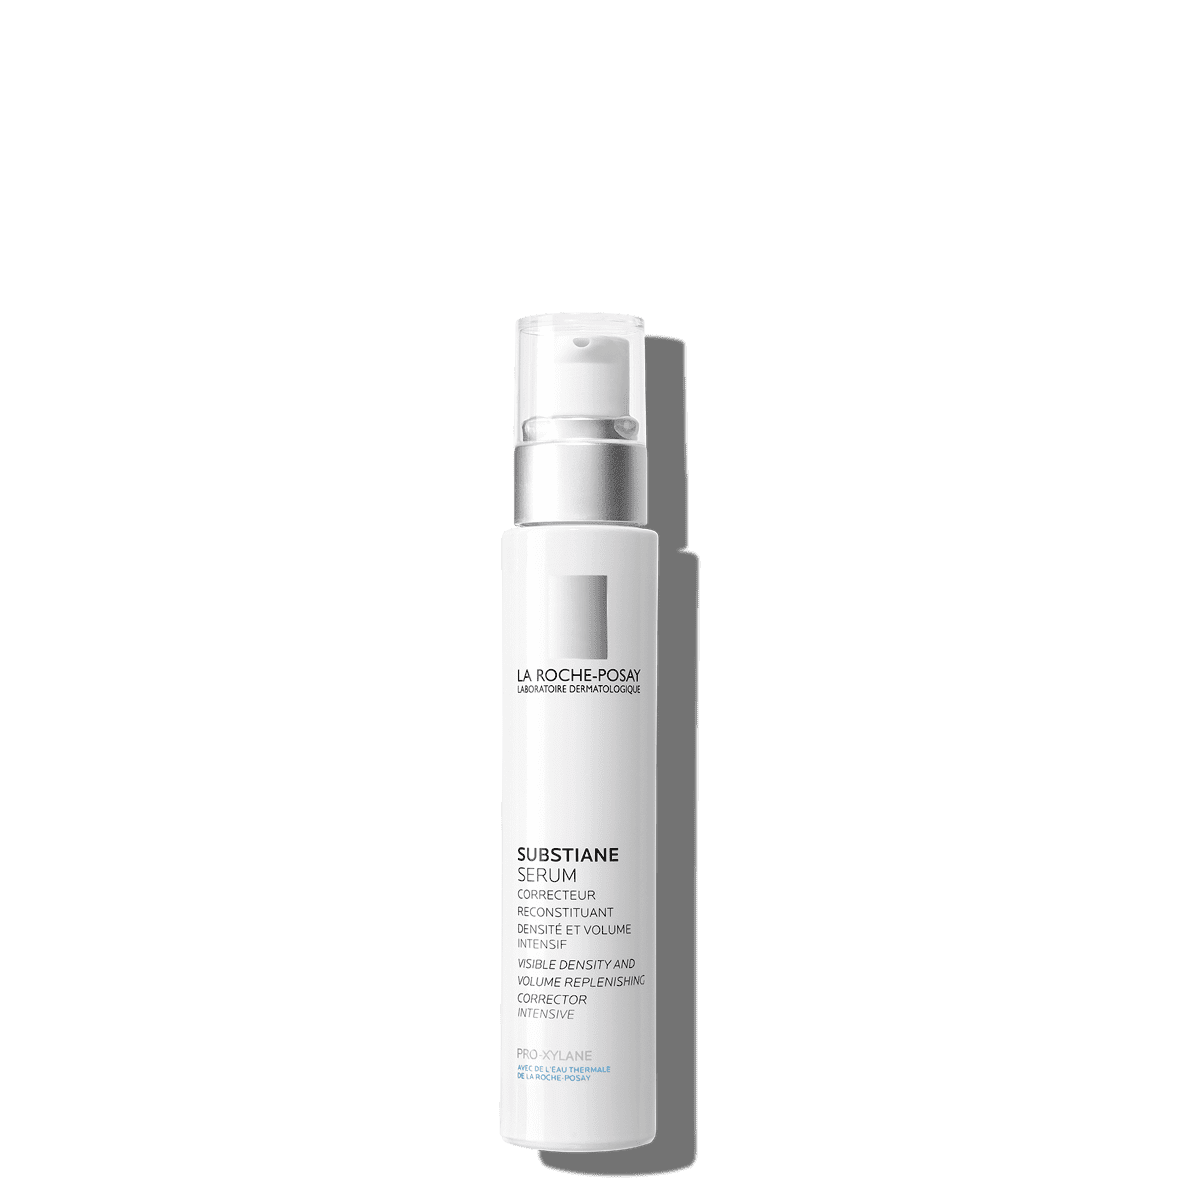 La Roche Posay ProductPage Anti Aging Serum Substiane Serum 30ml 33378